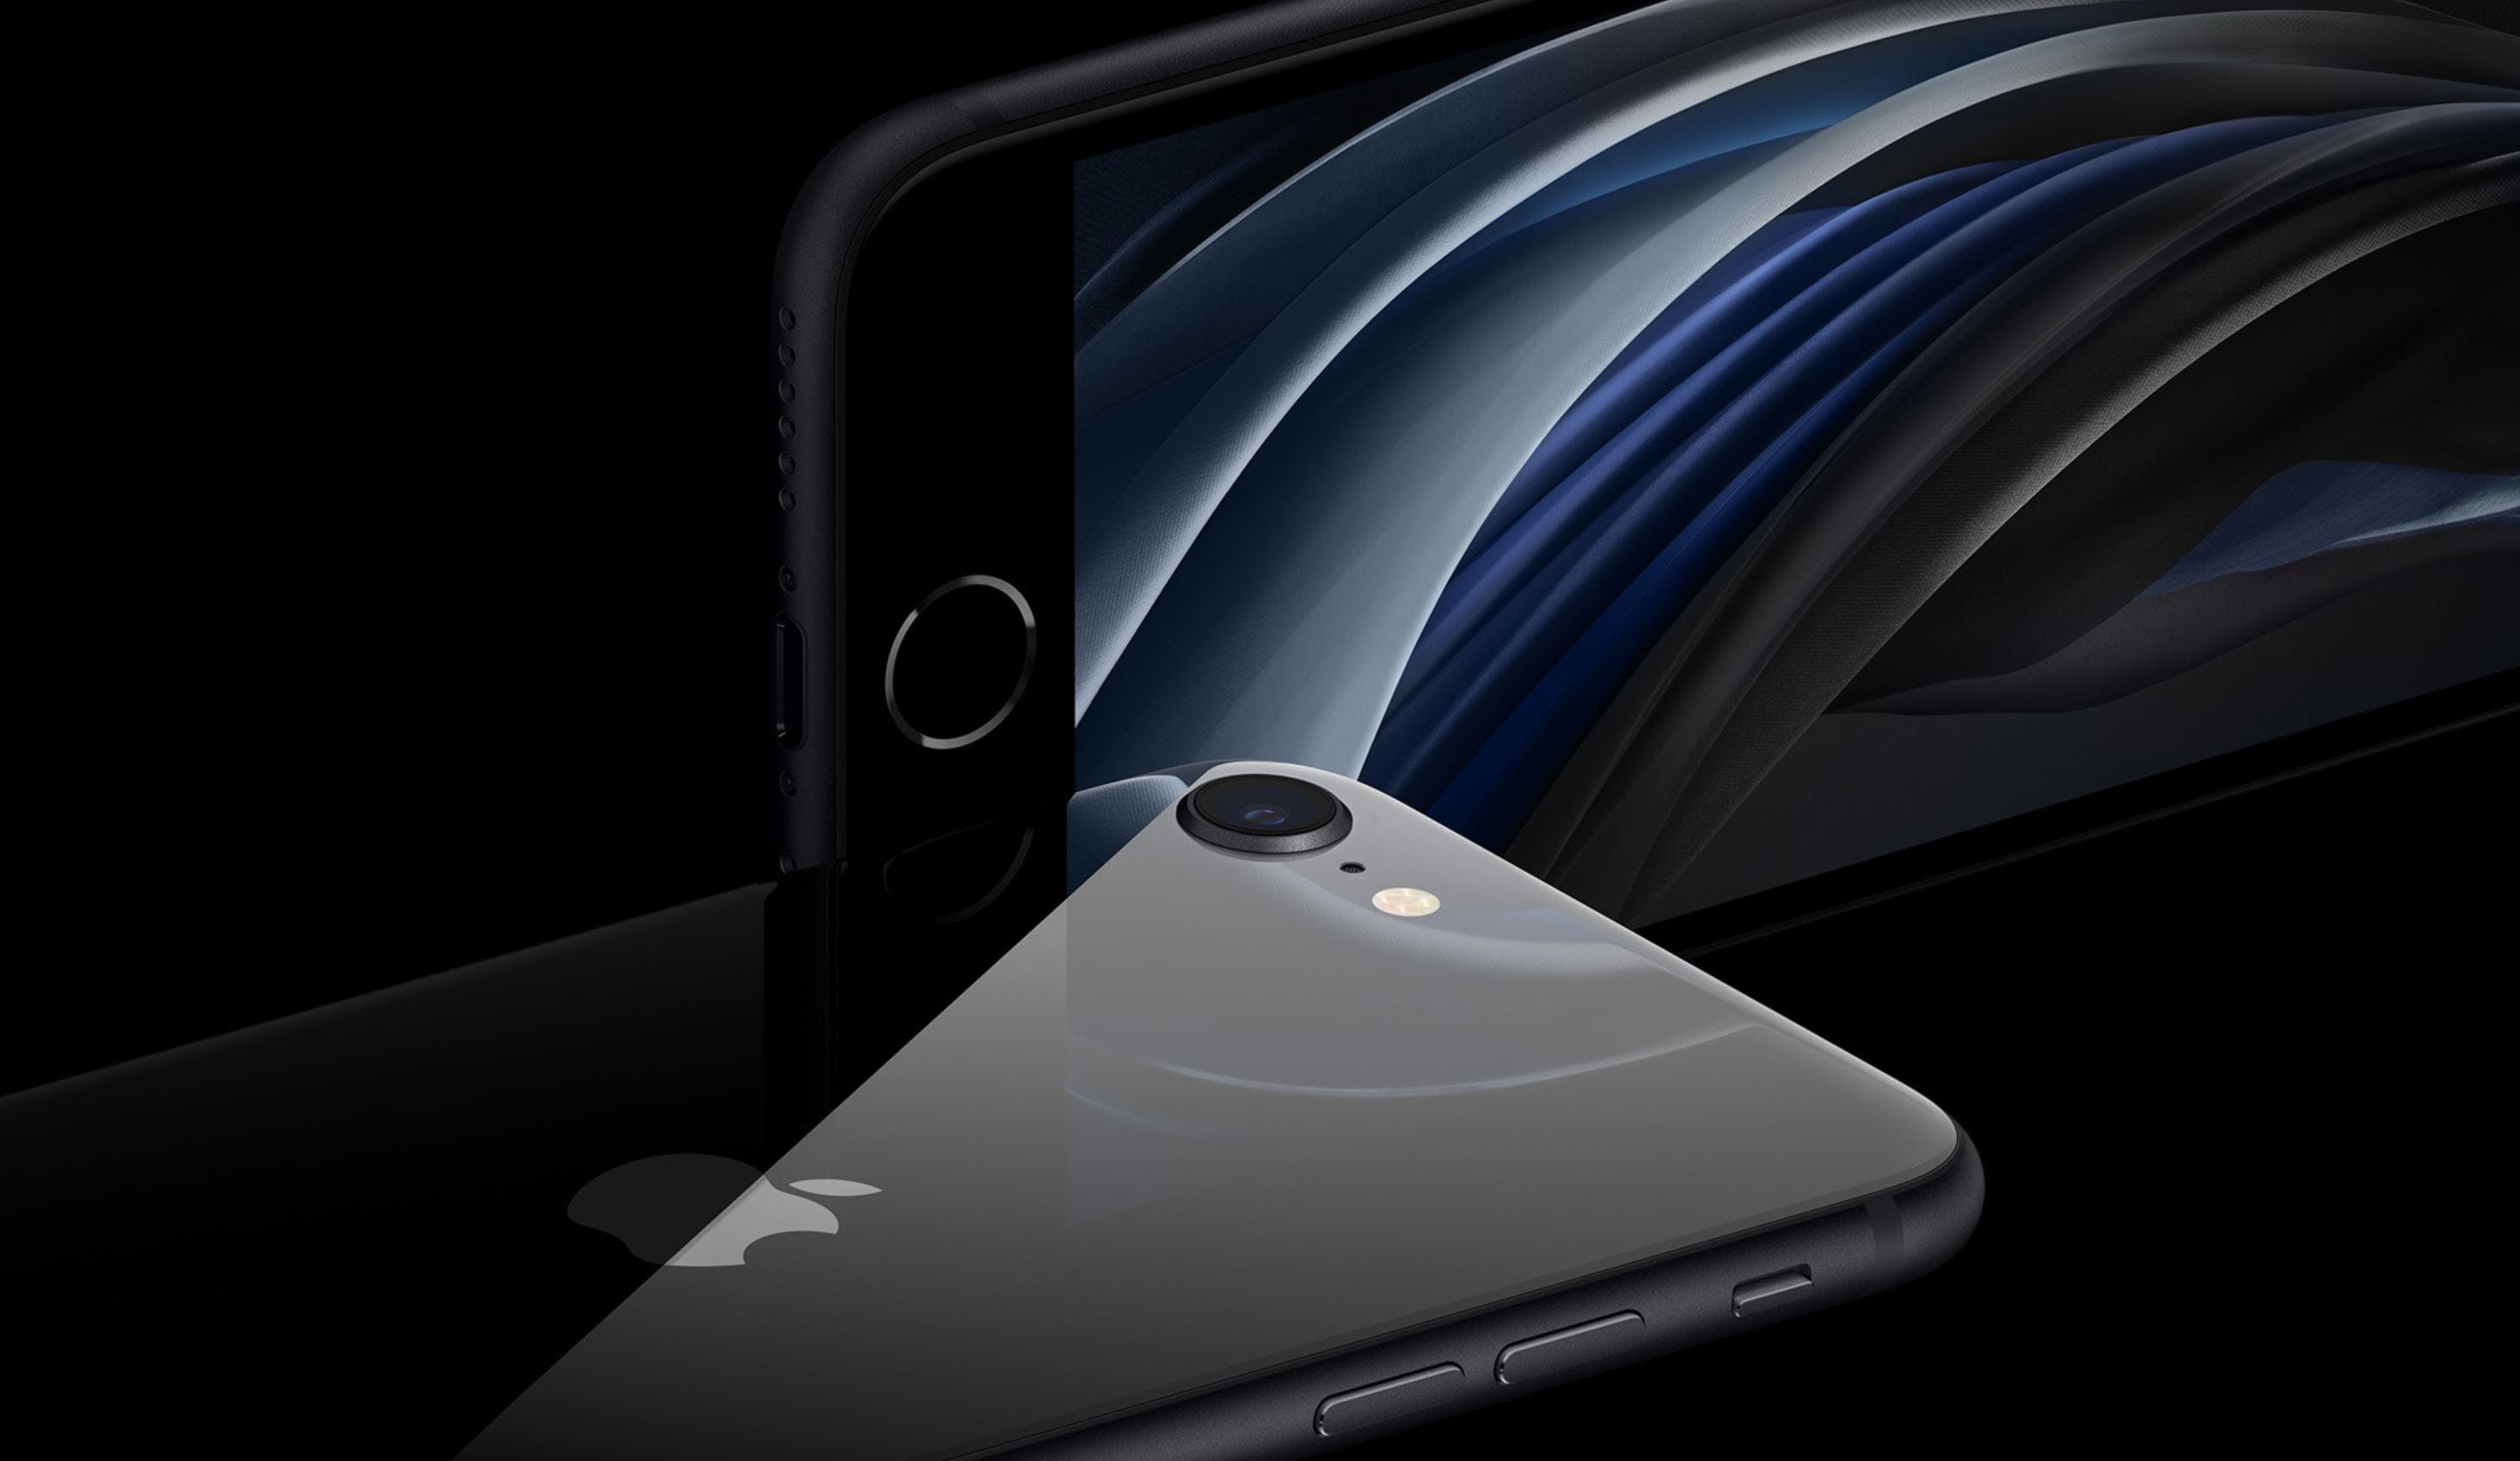 The Original iPhone SE Has Finally Received an Upgrade